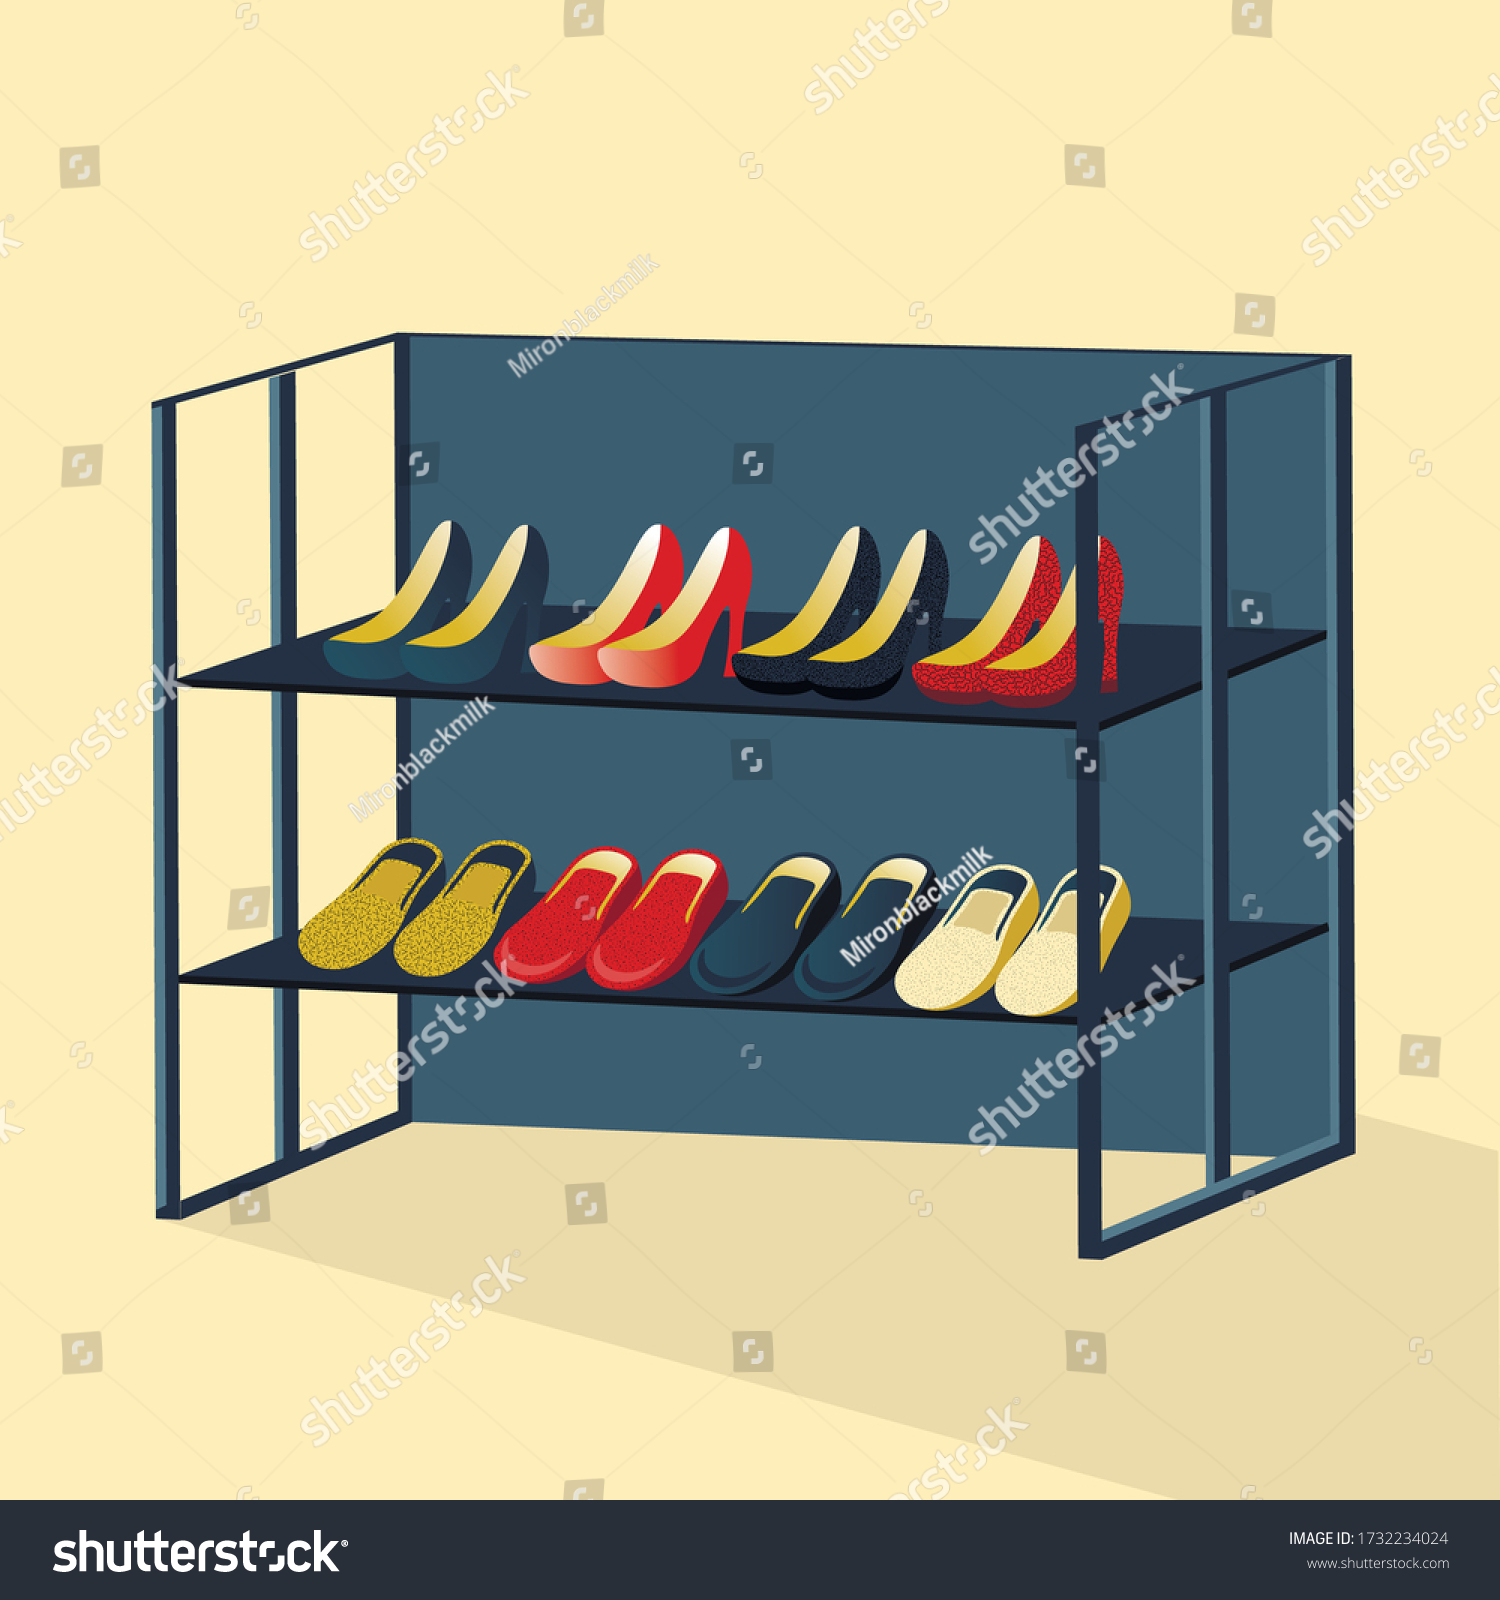 https www shutterstock com image vector isometric interior wardrobe shoe rack fashionable 1732234024